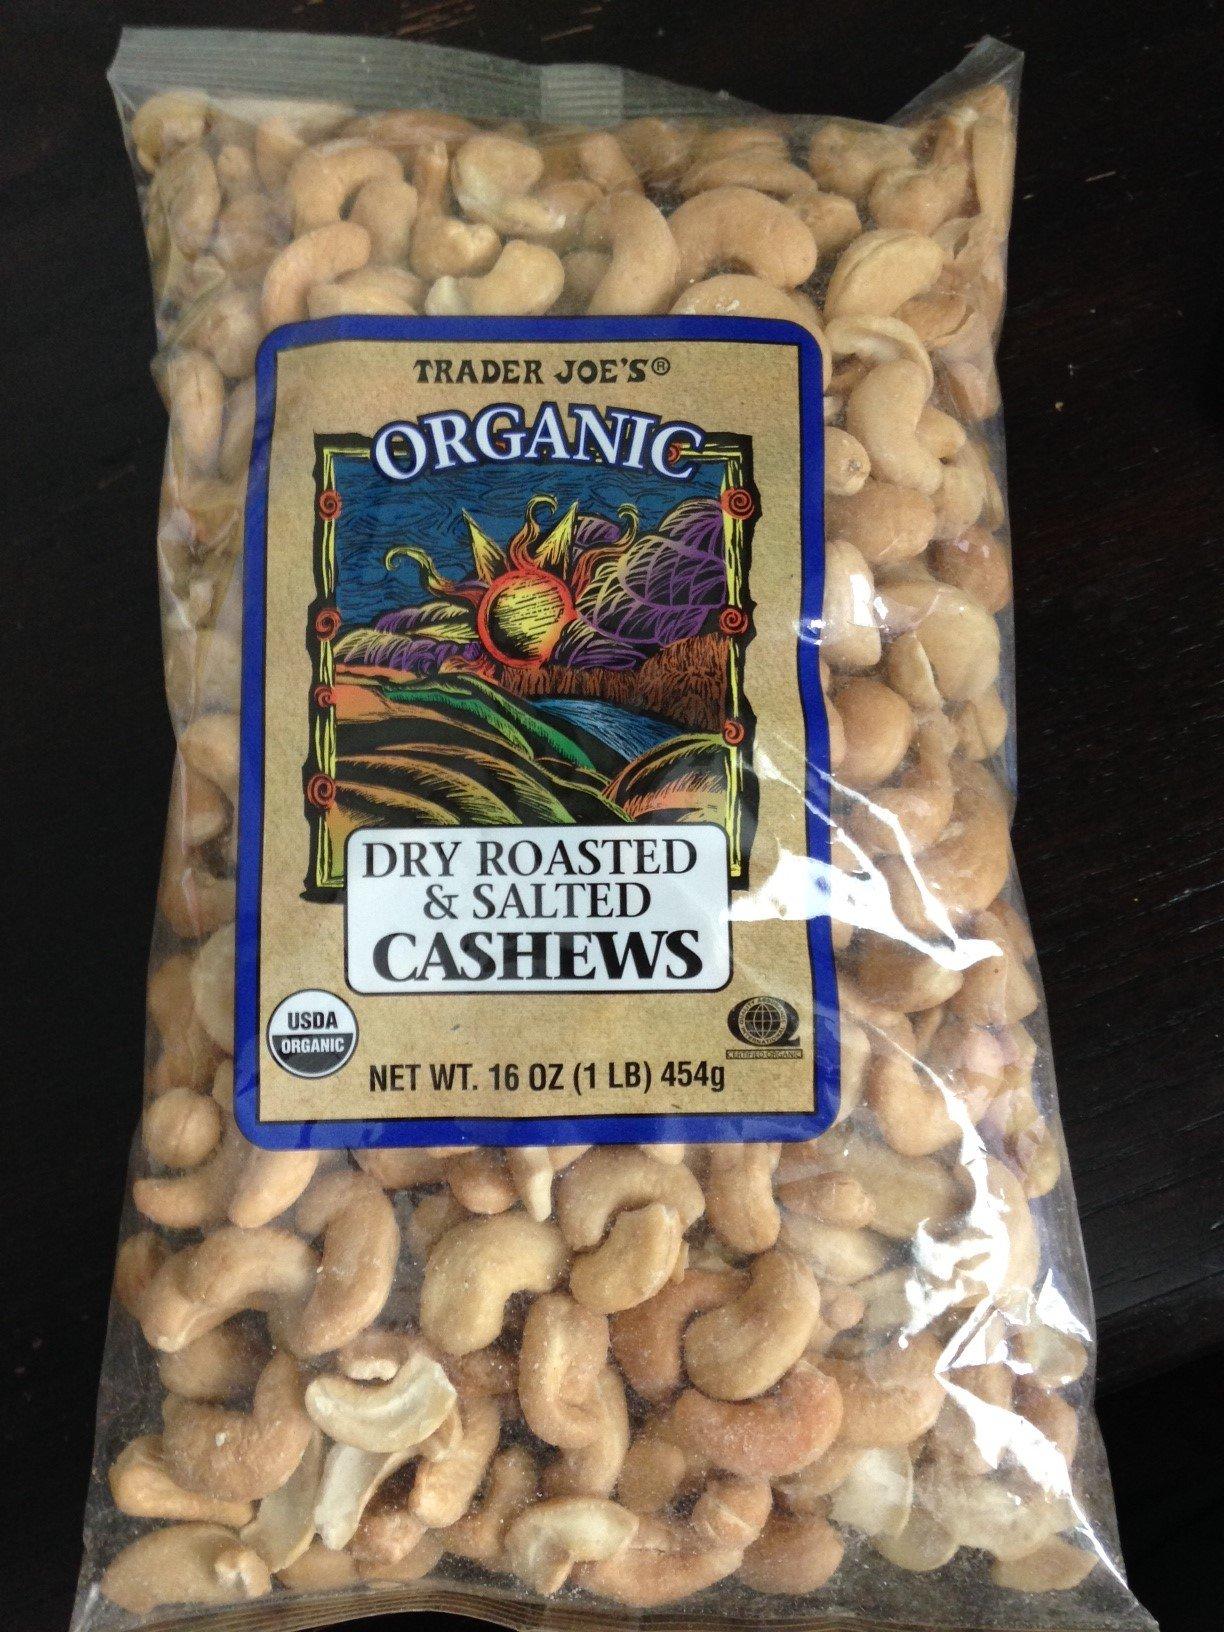 Trader Joe's Organic Dry Roasted & Salted Cashews 16 oz